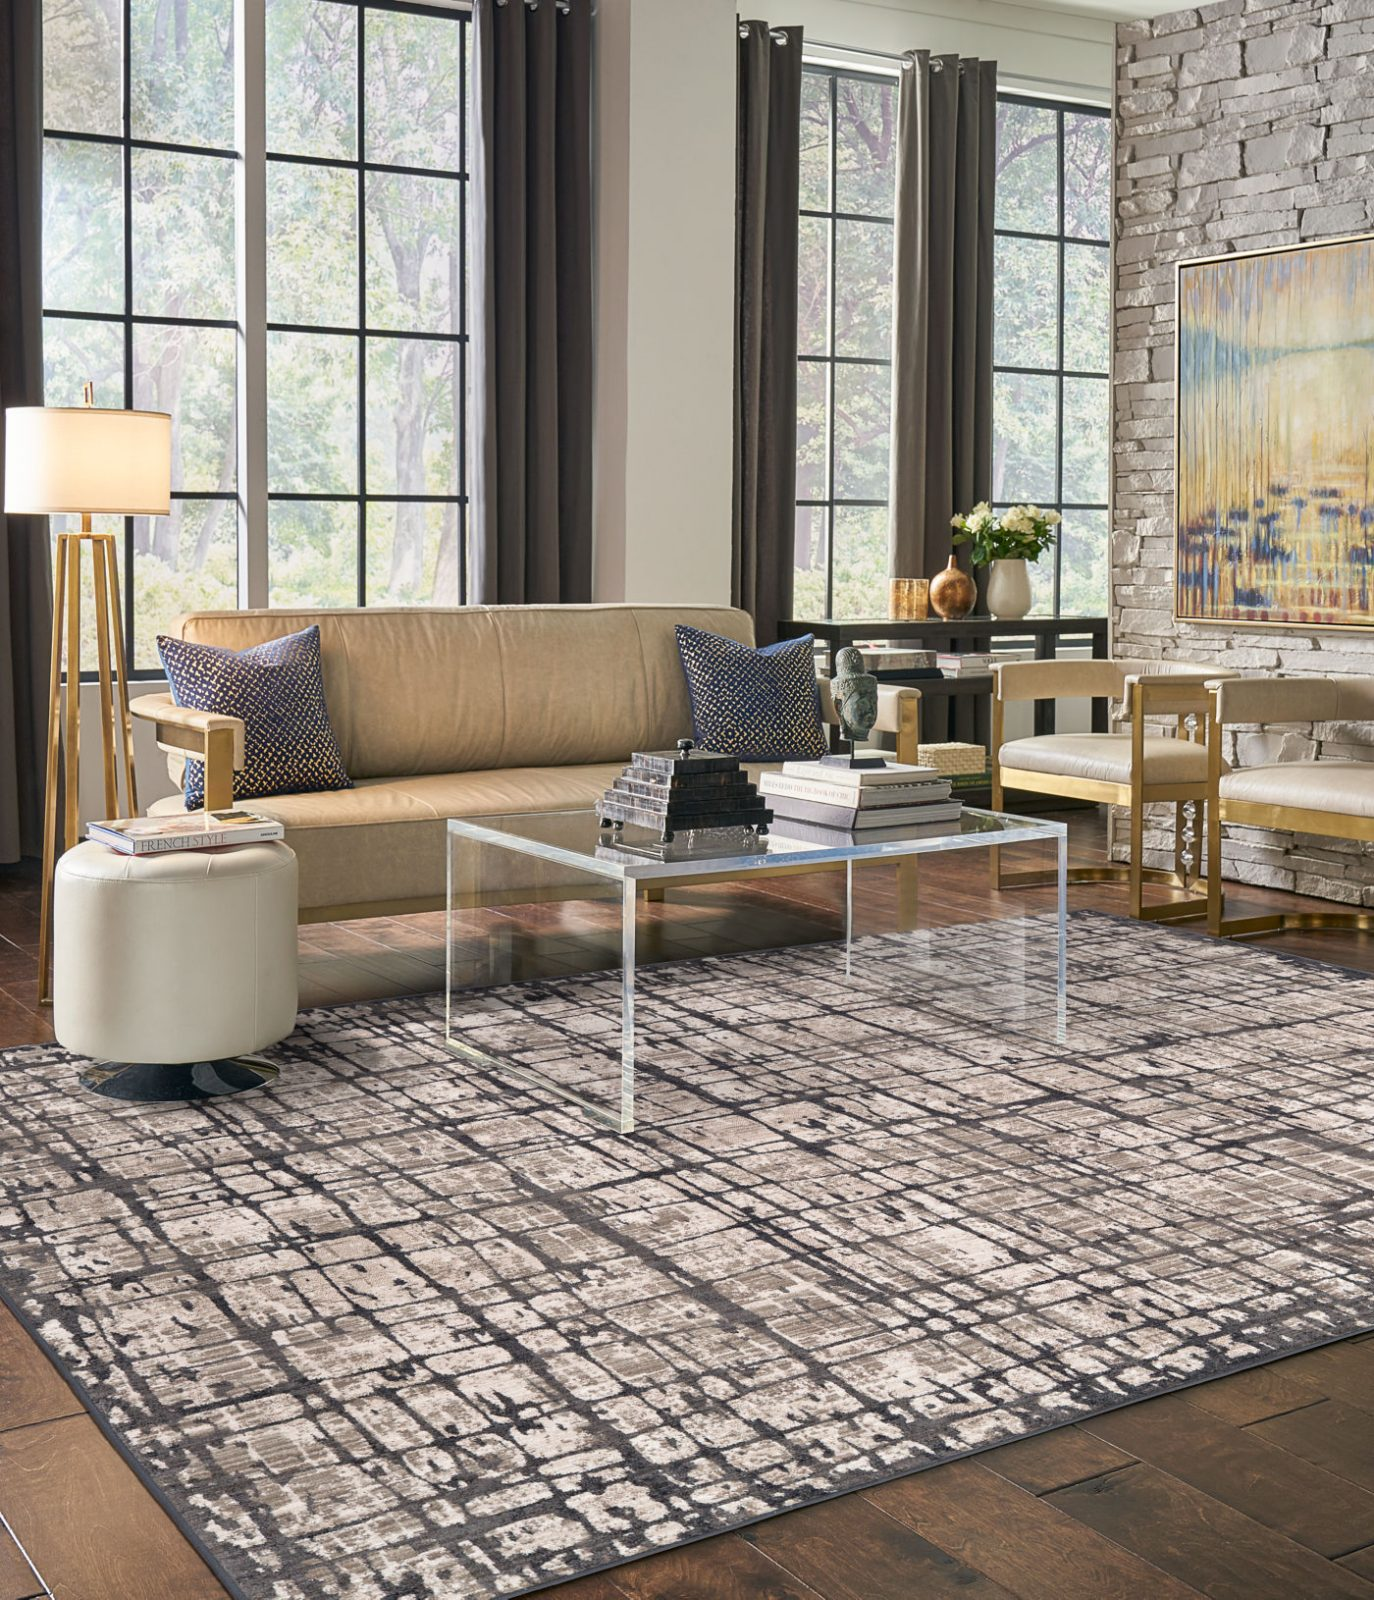 Area Rug Gallery - Flooring Inspiration